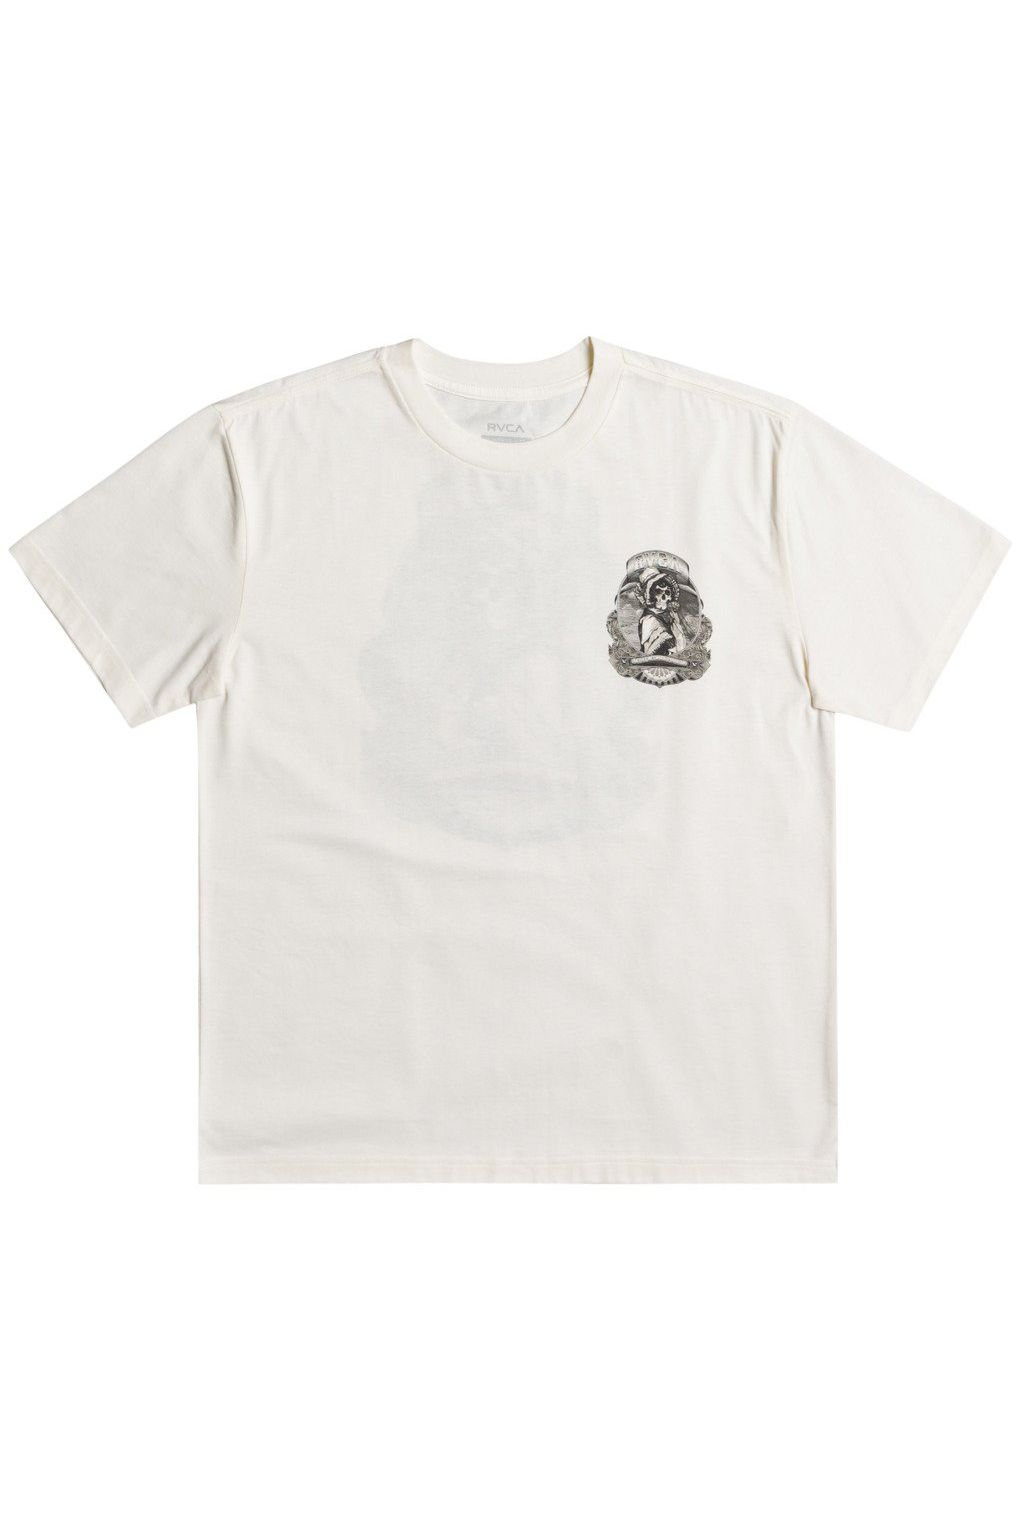 RVCA T-Shirt SKULL BONNET GEORGE THOMPSON Antique White